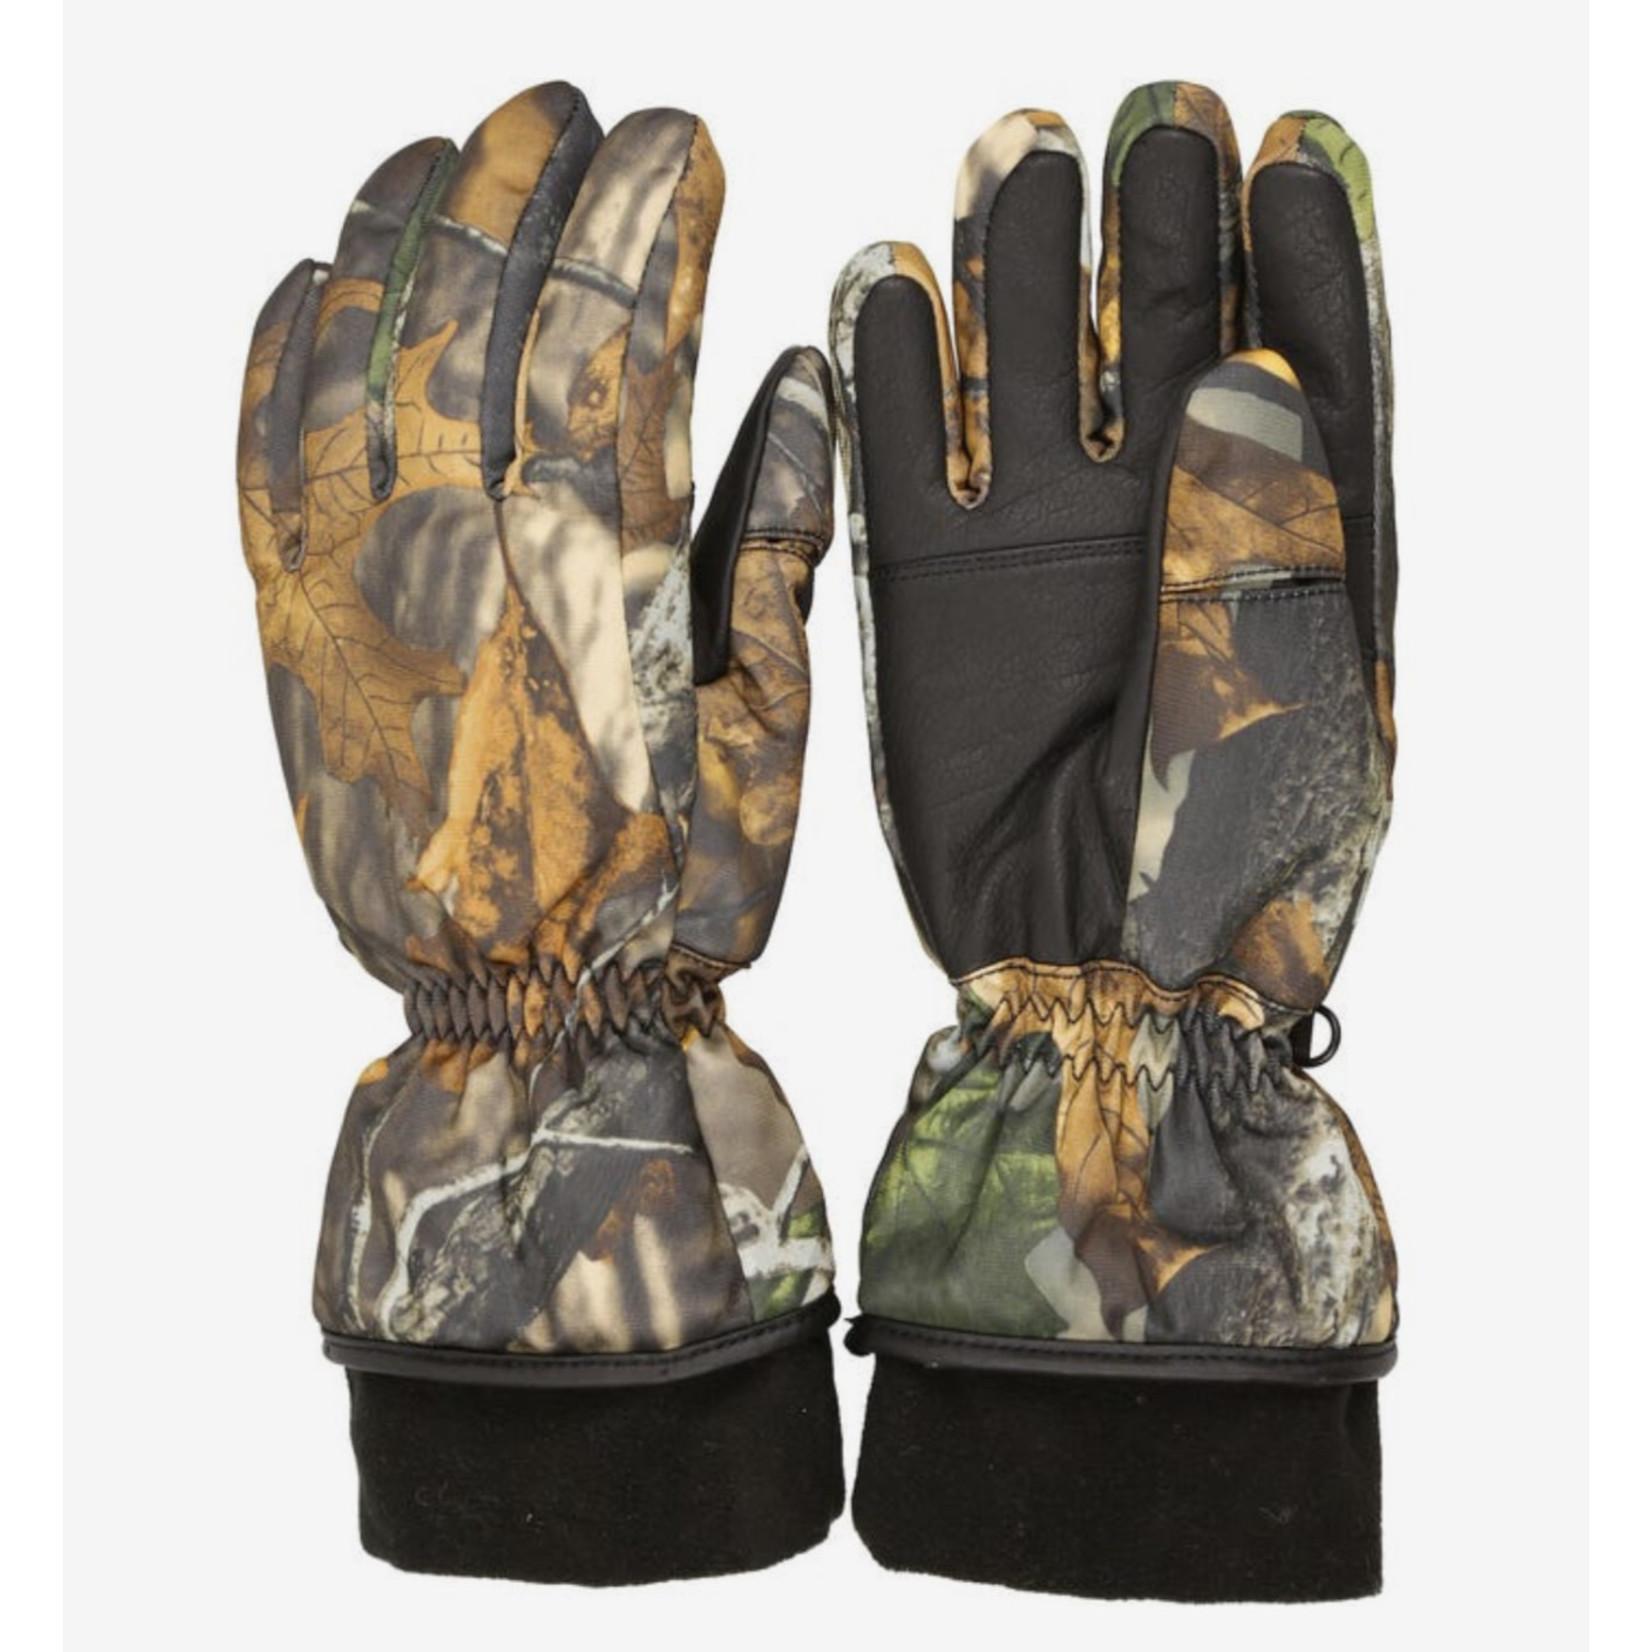 Gks Ganka GKS Buckshot Hunting Gloves 64-2050